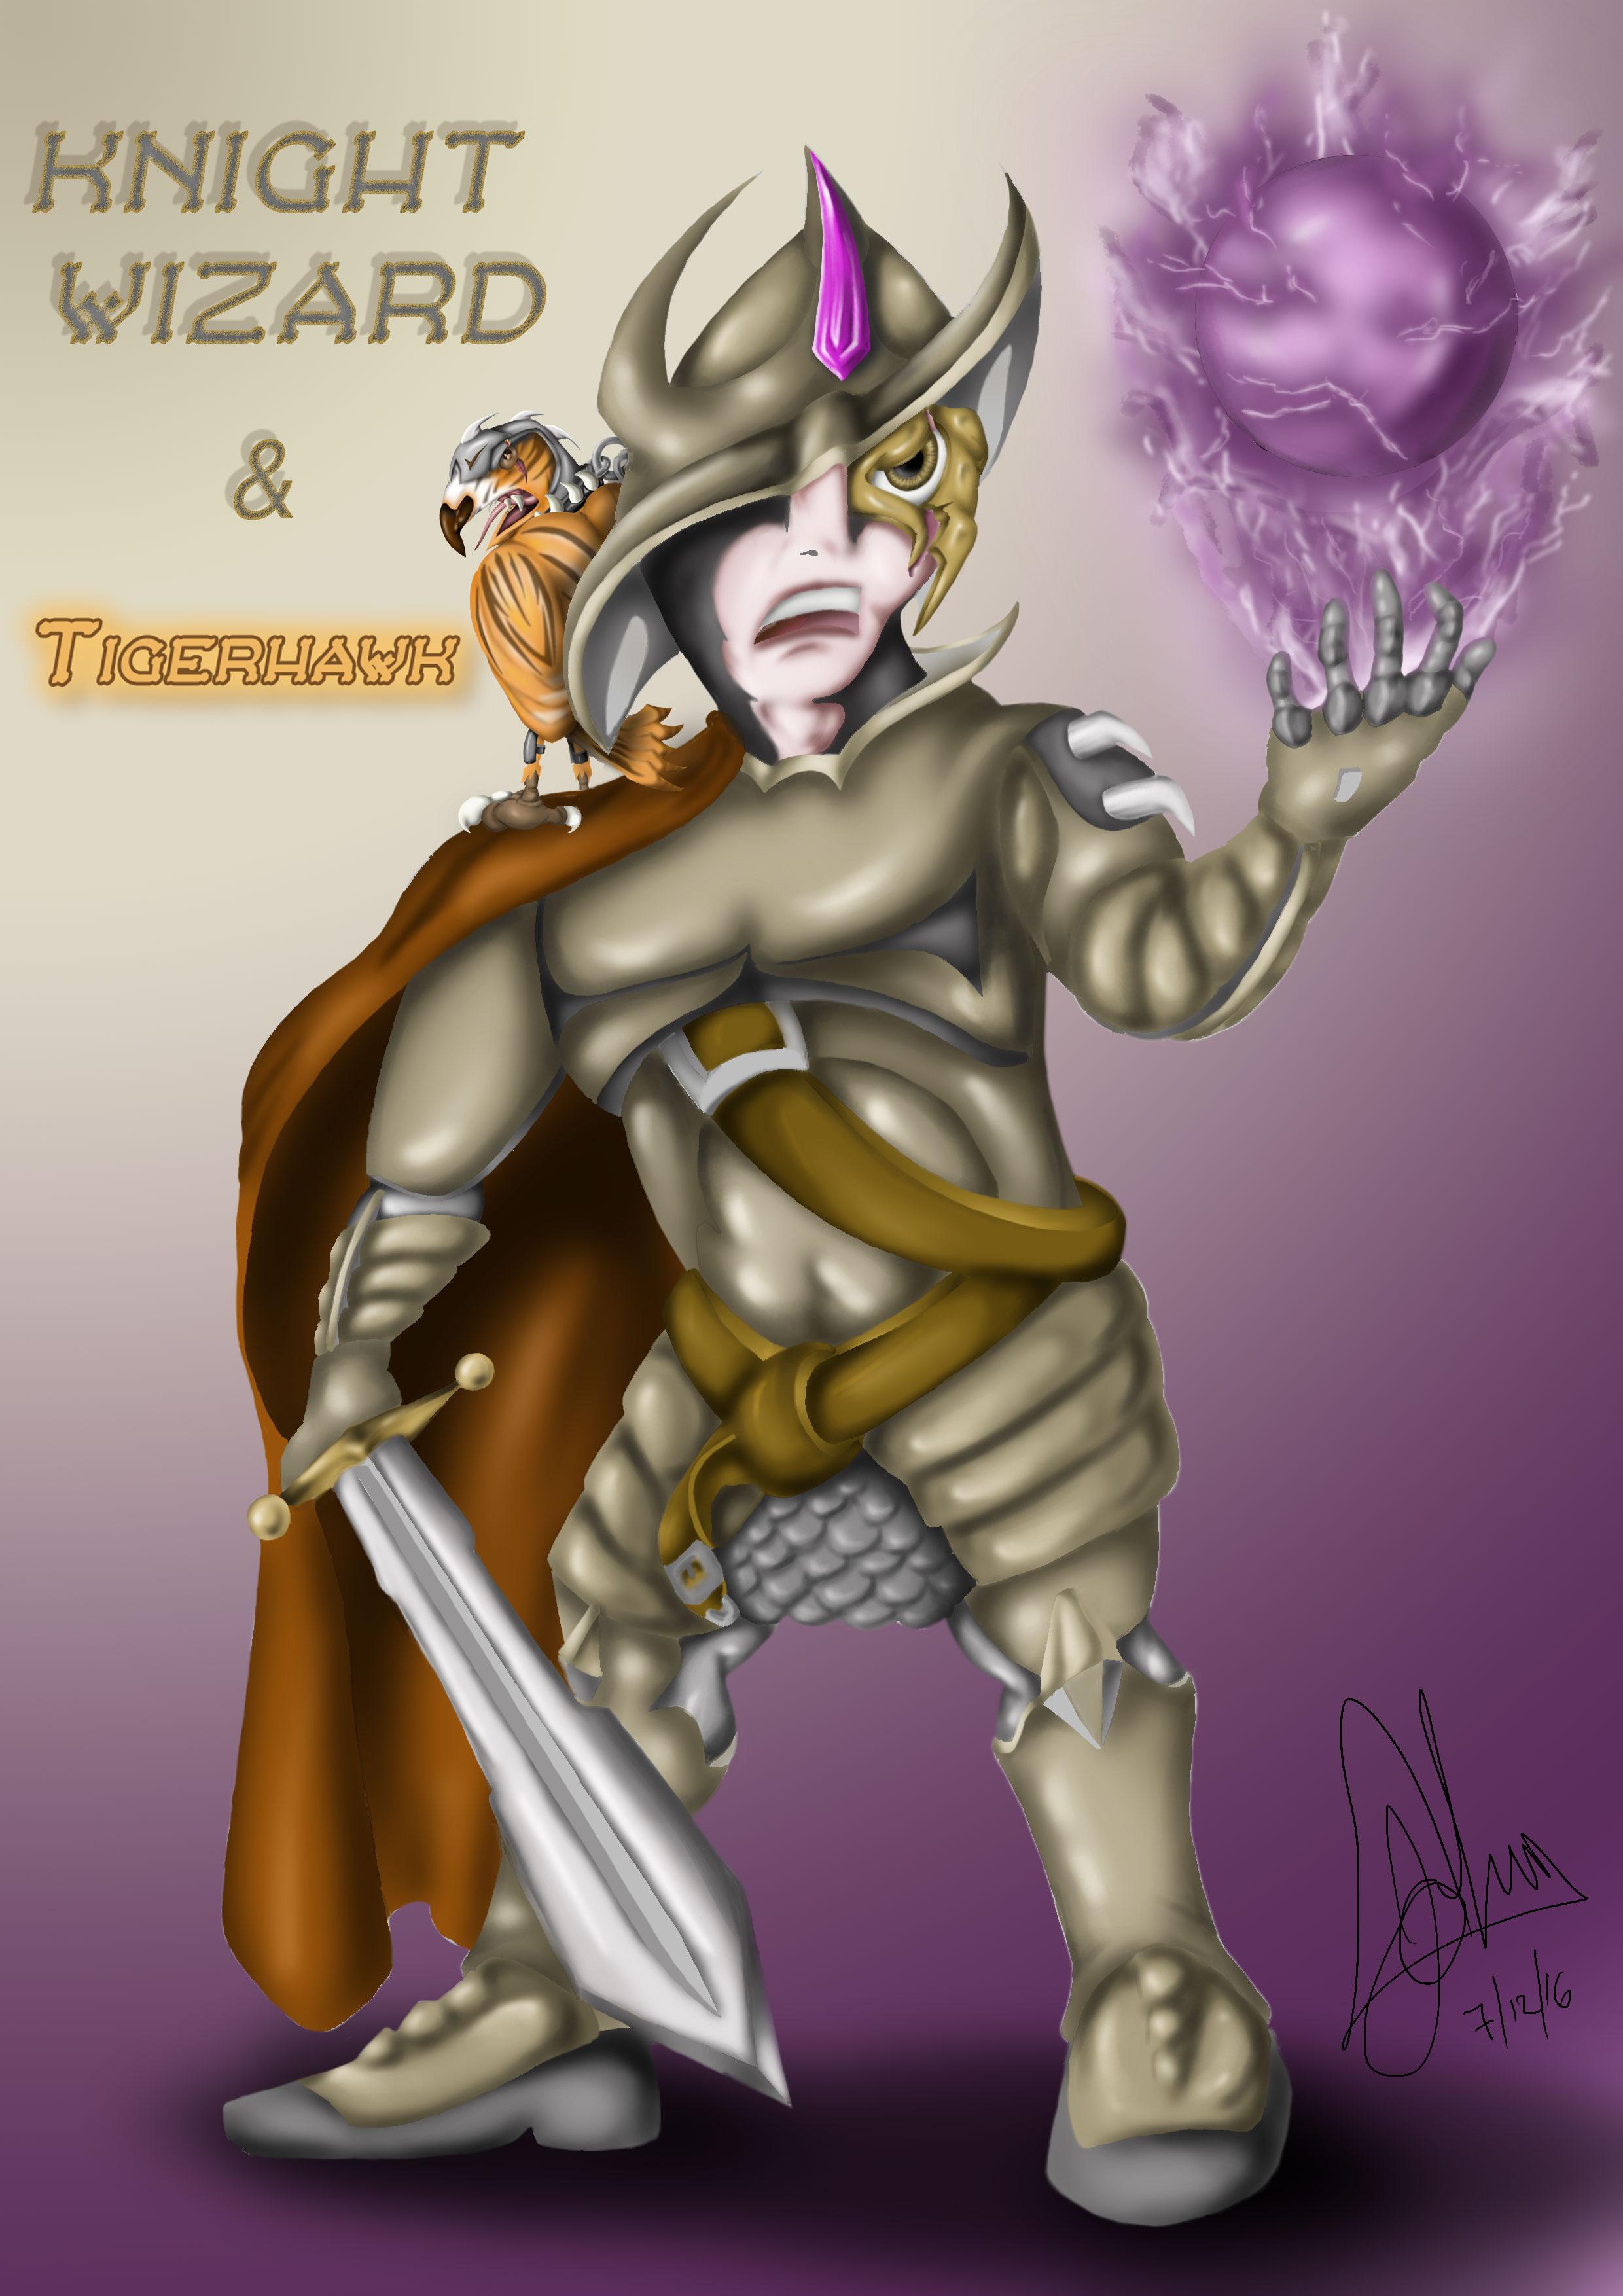 Knight Wizard & The Tigerhawk